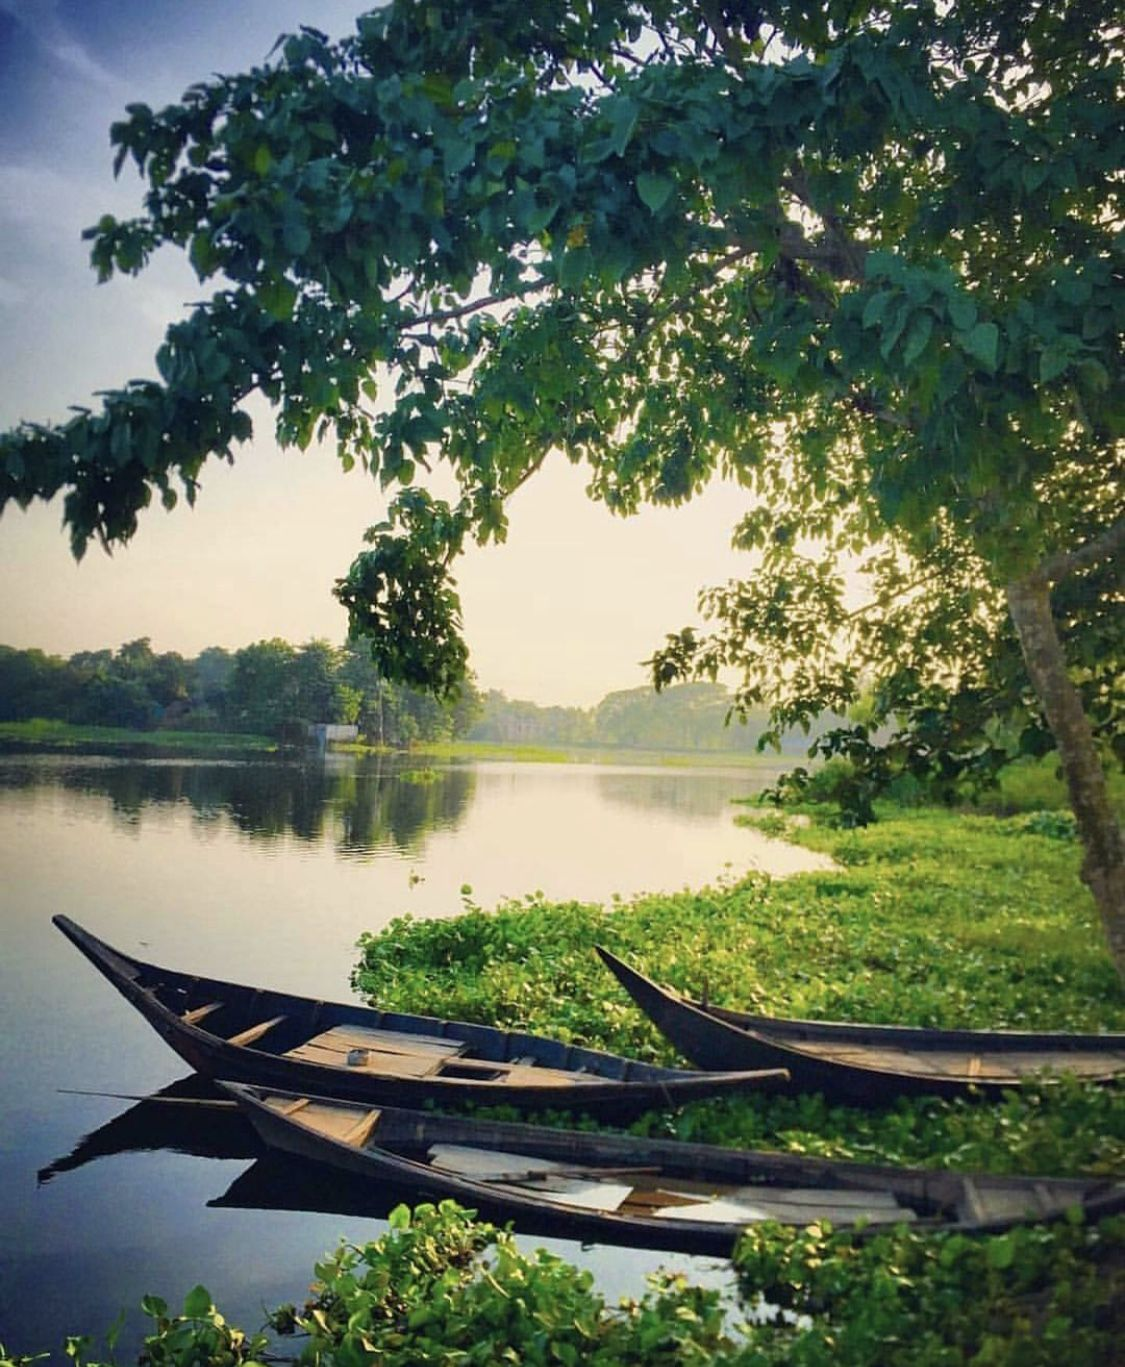 Beautiful Bangladesh: Water, Boats And Life In 2019